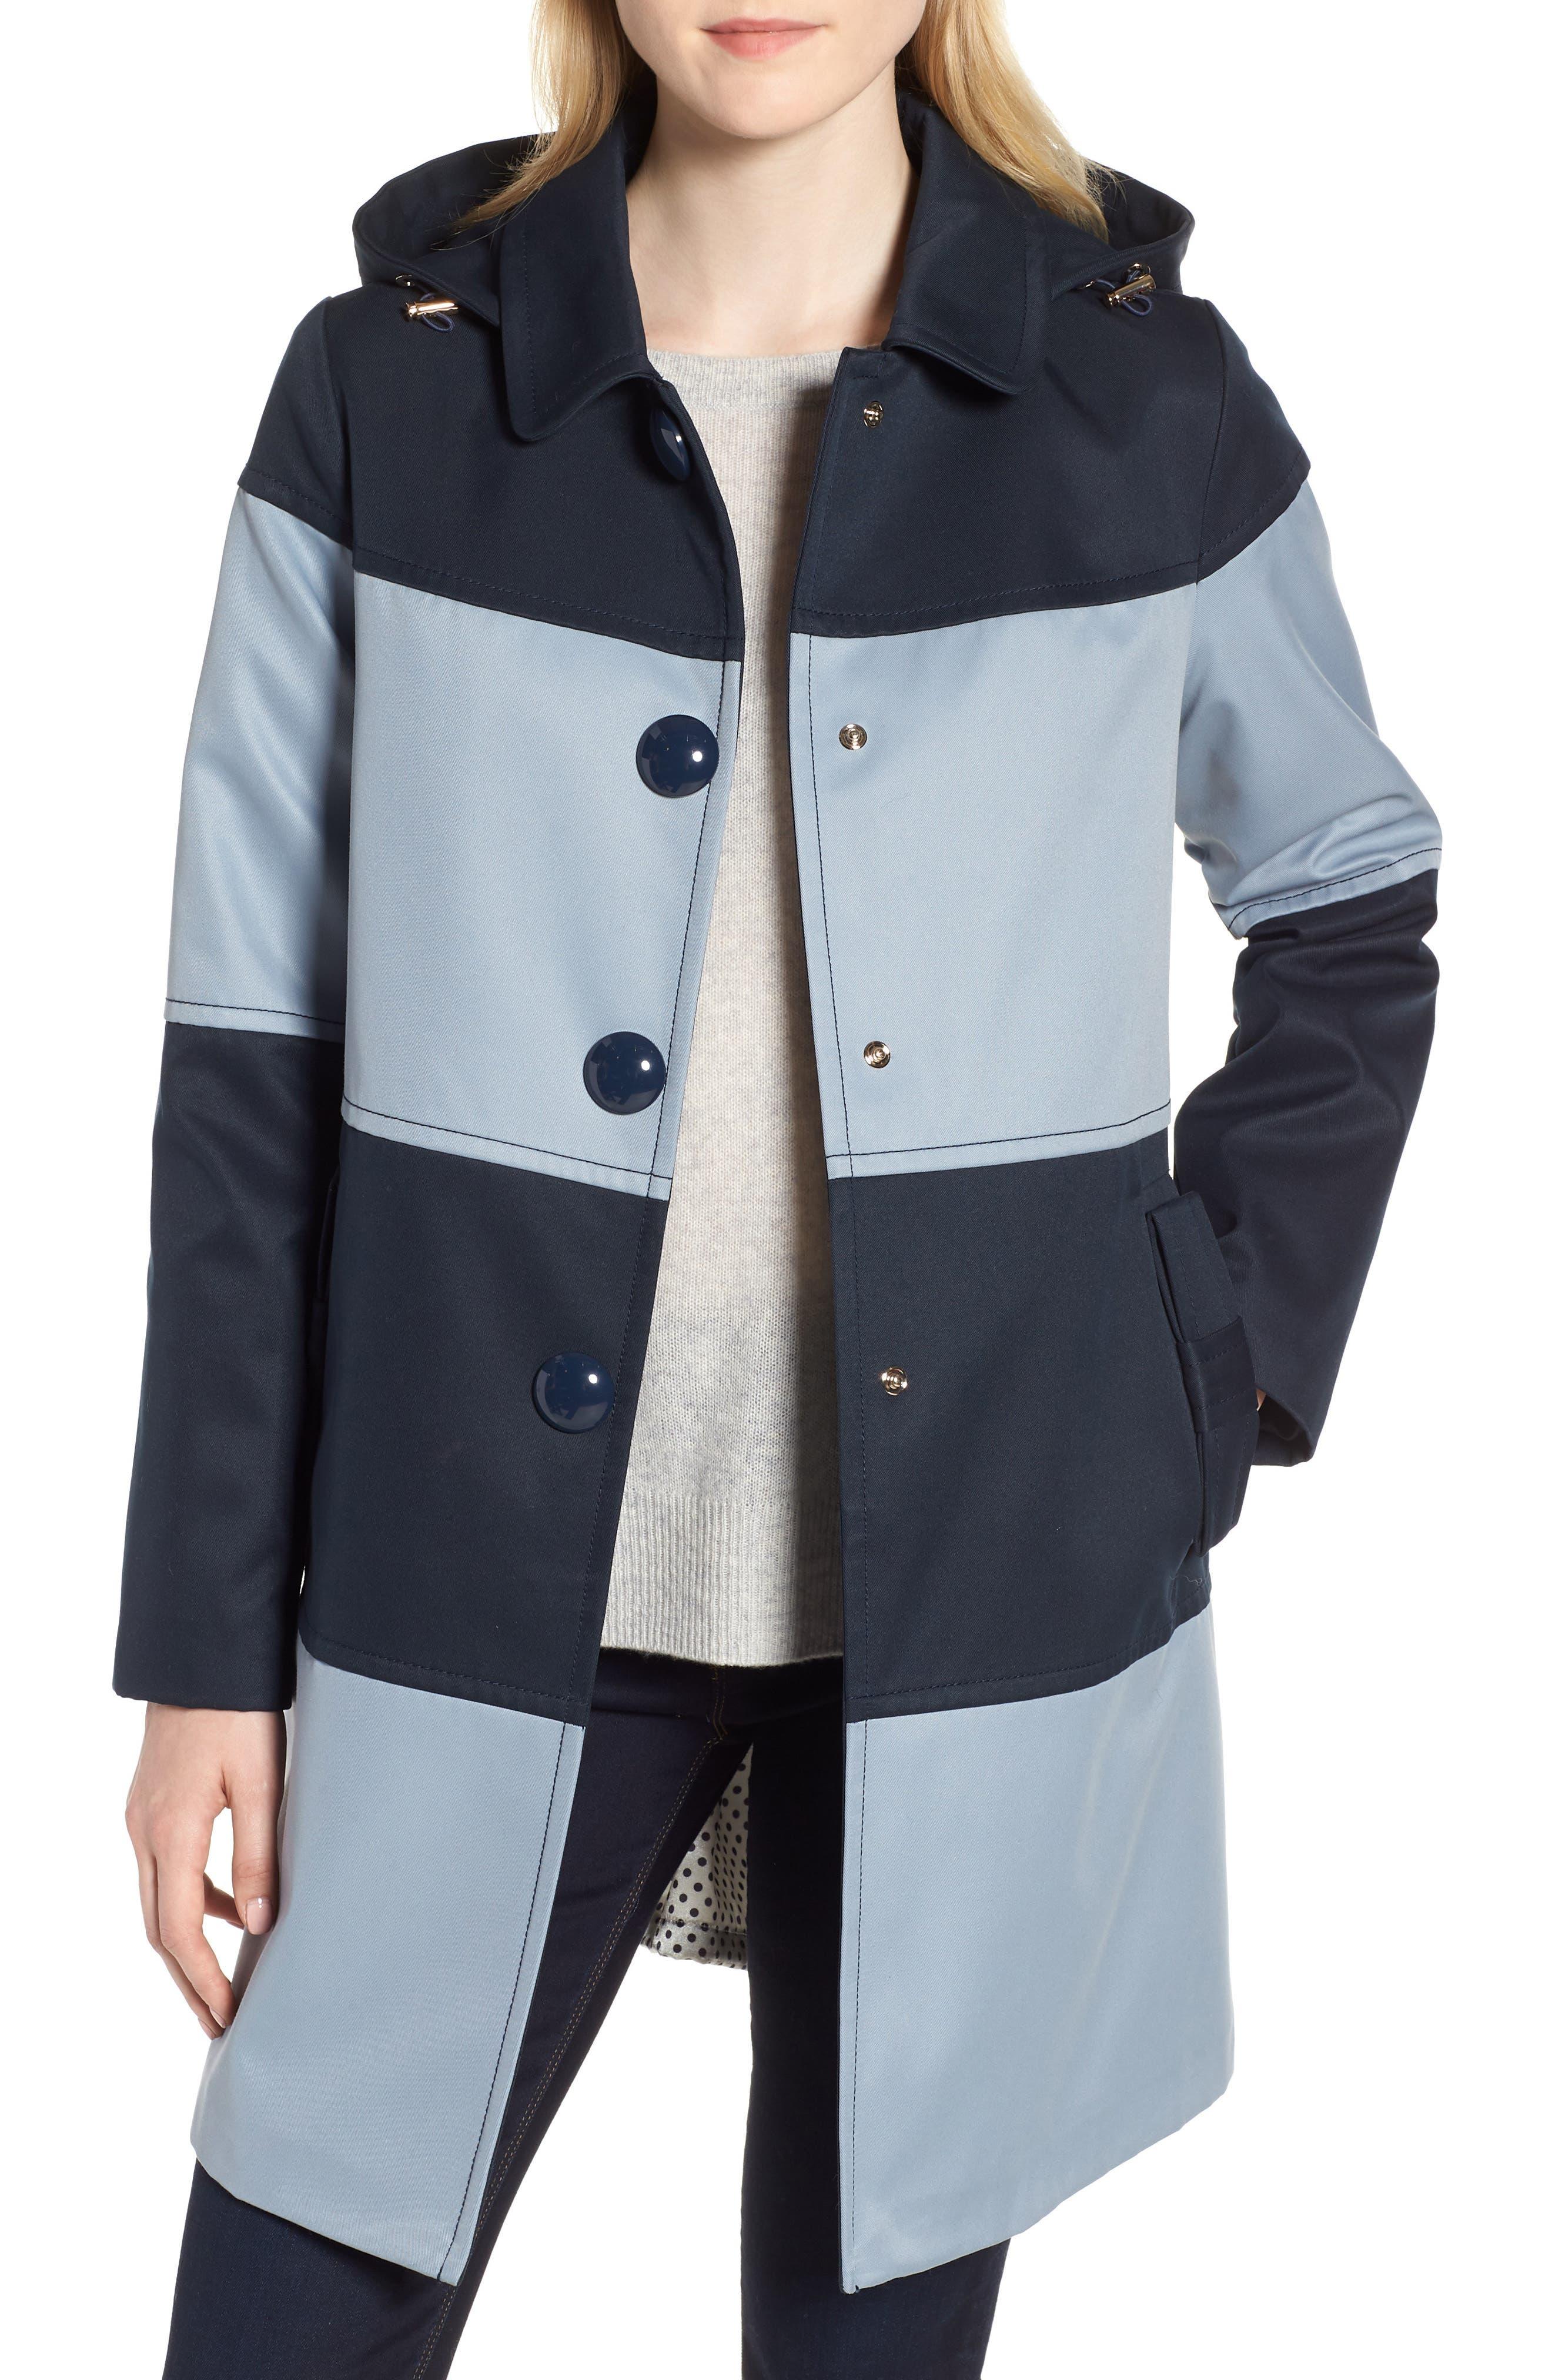 colorblock raincoat,                         Main,                         color, Dusty Blue/ Navy